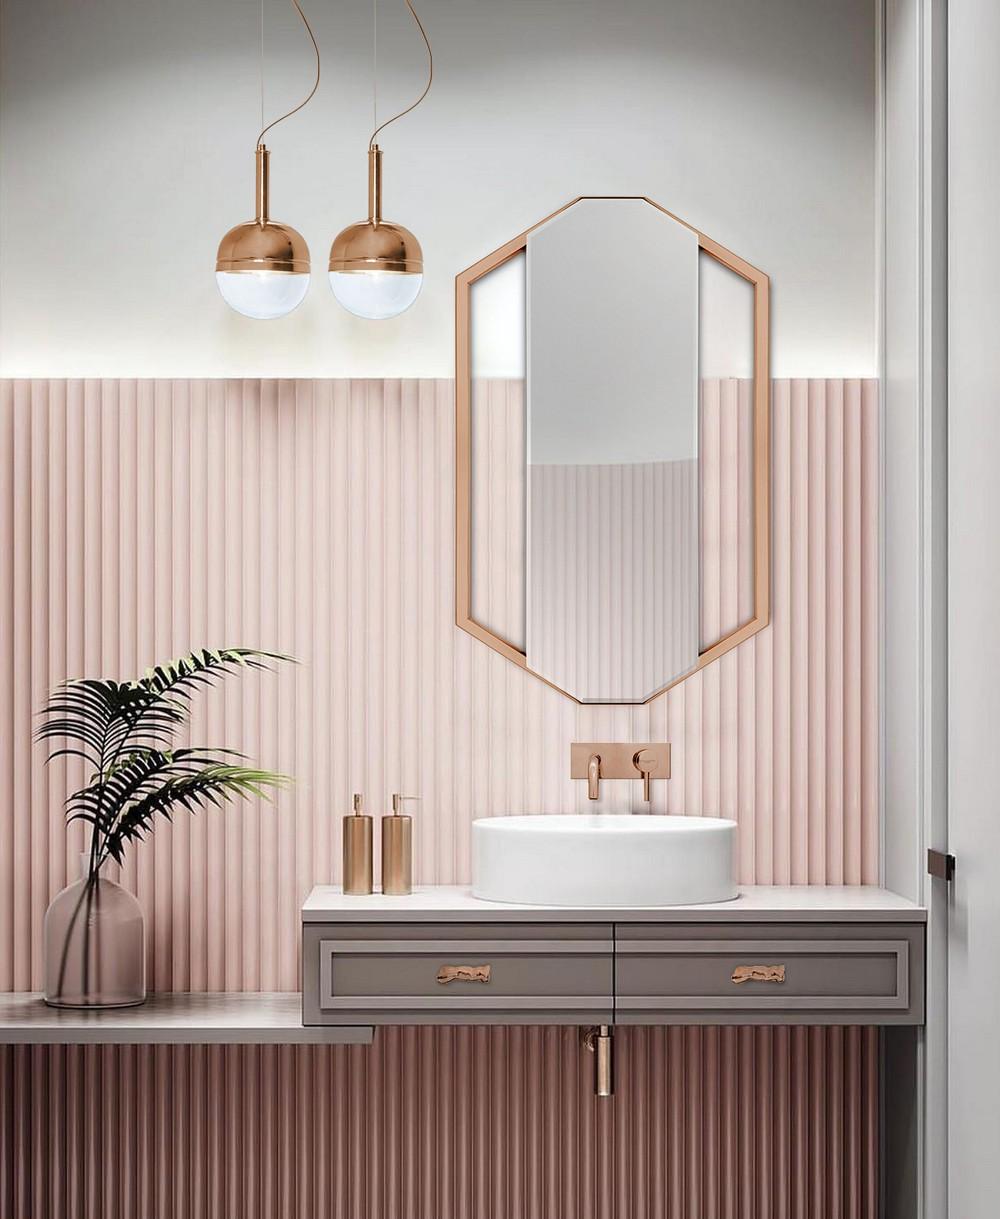 Bathroom Design Come Upon the Best Luxury Showrooms in Melbourne (5)